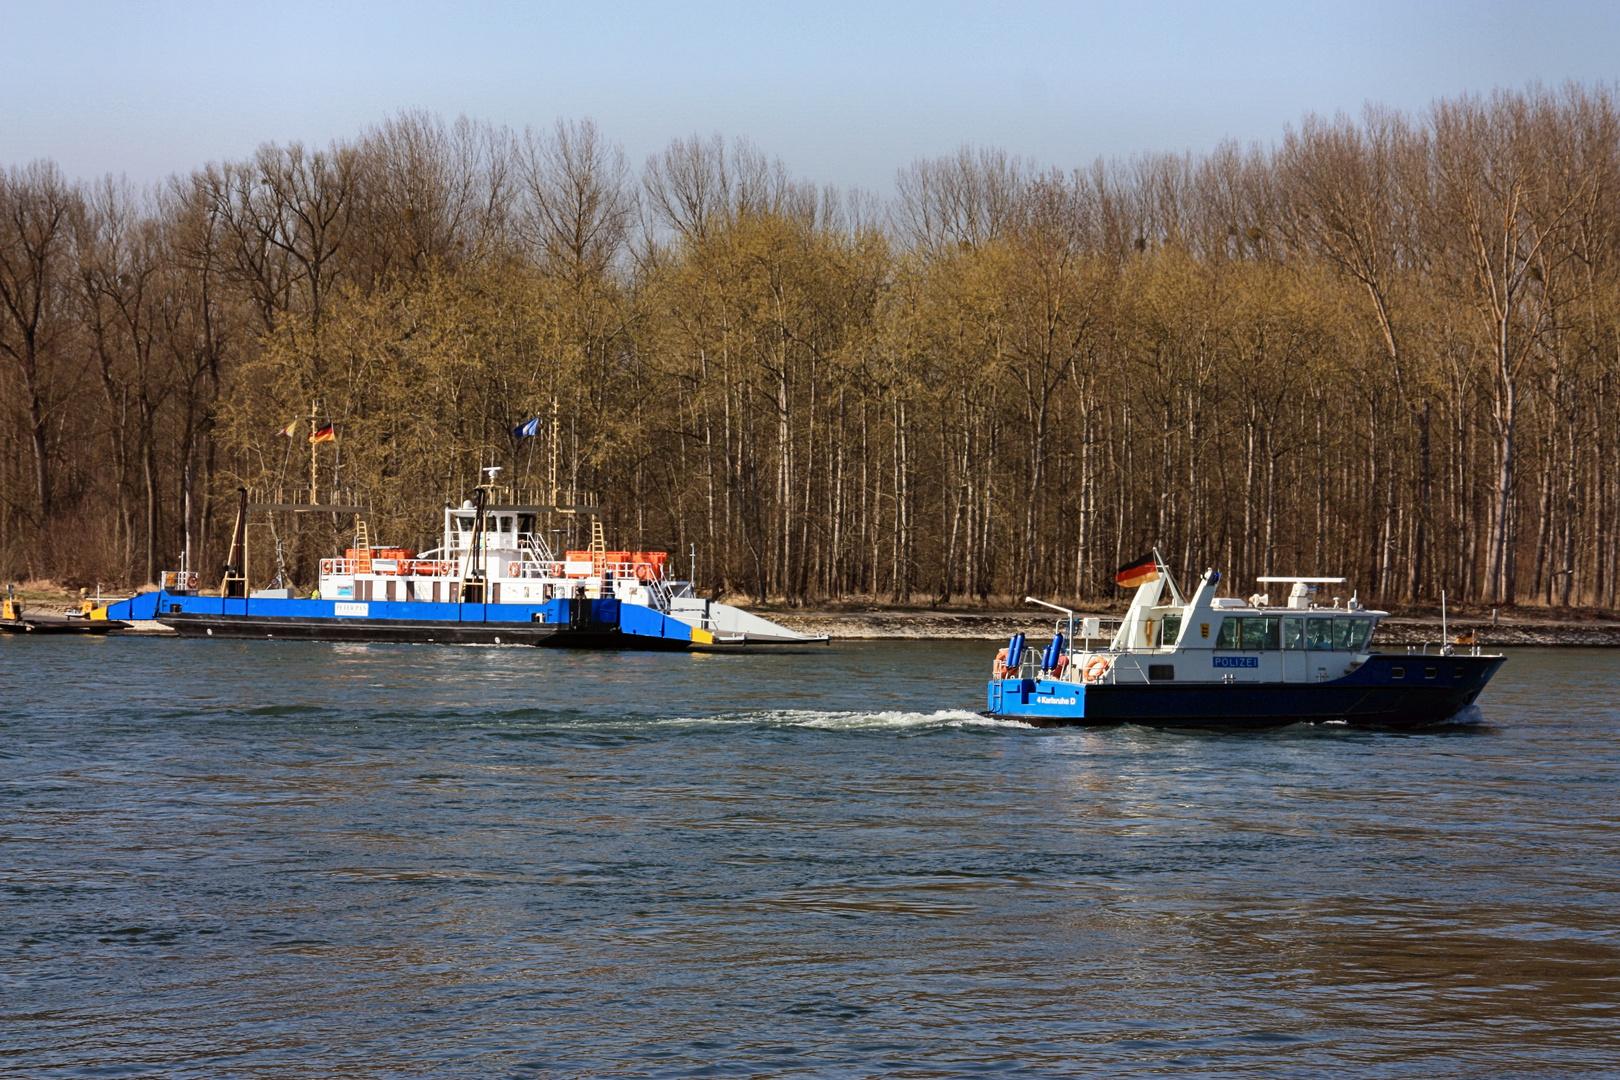 Rhein-Fähre Peter Pan